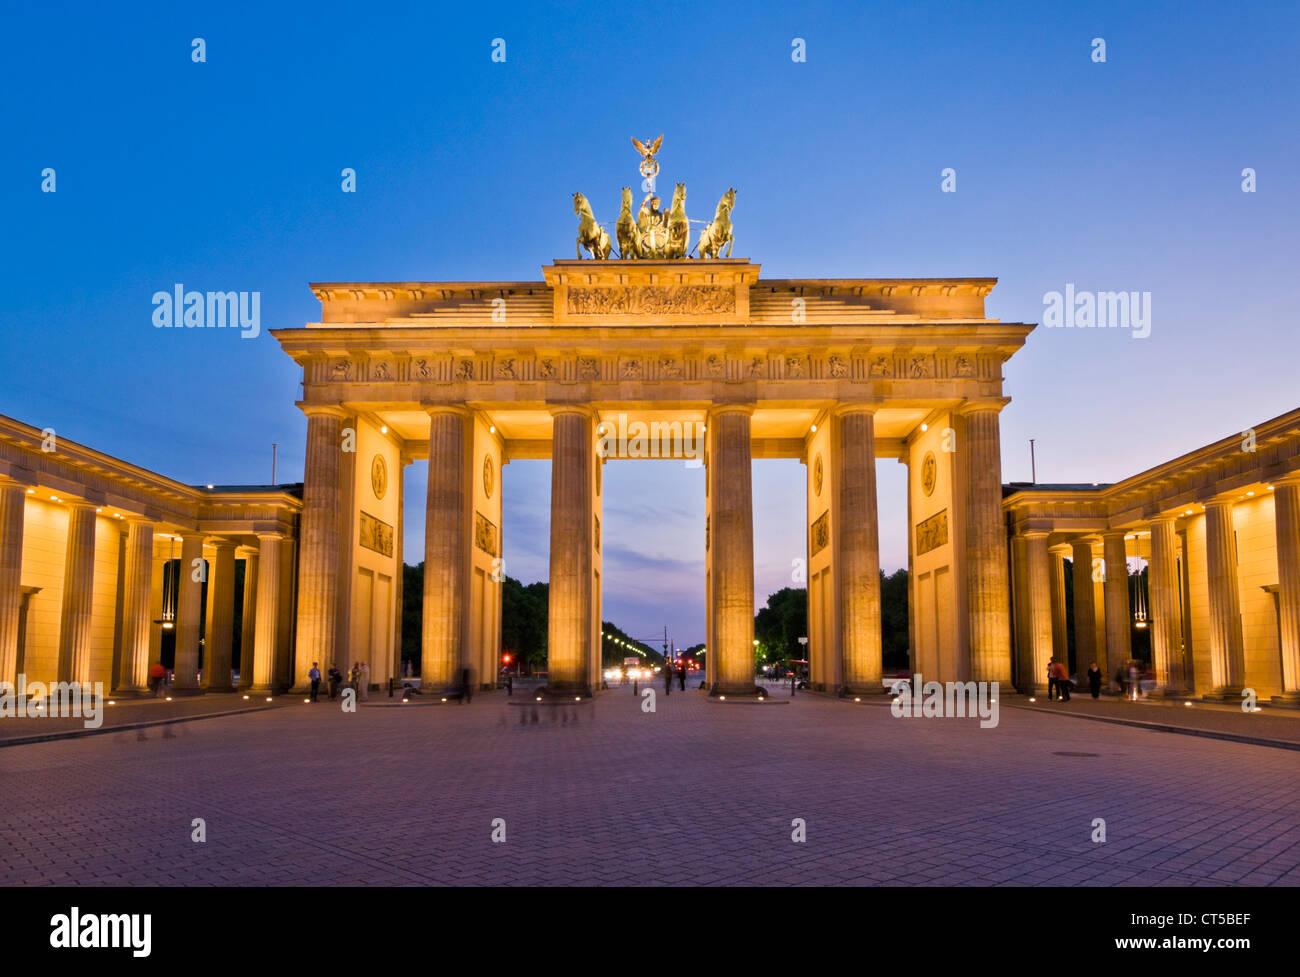 Brandenburg gate Pariser Platz with the winged Quadriga statue on top at sunset Berlin city centre Germany EU Europe Stock Photo